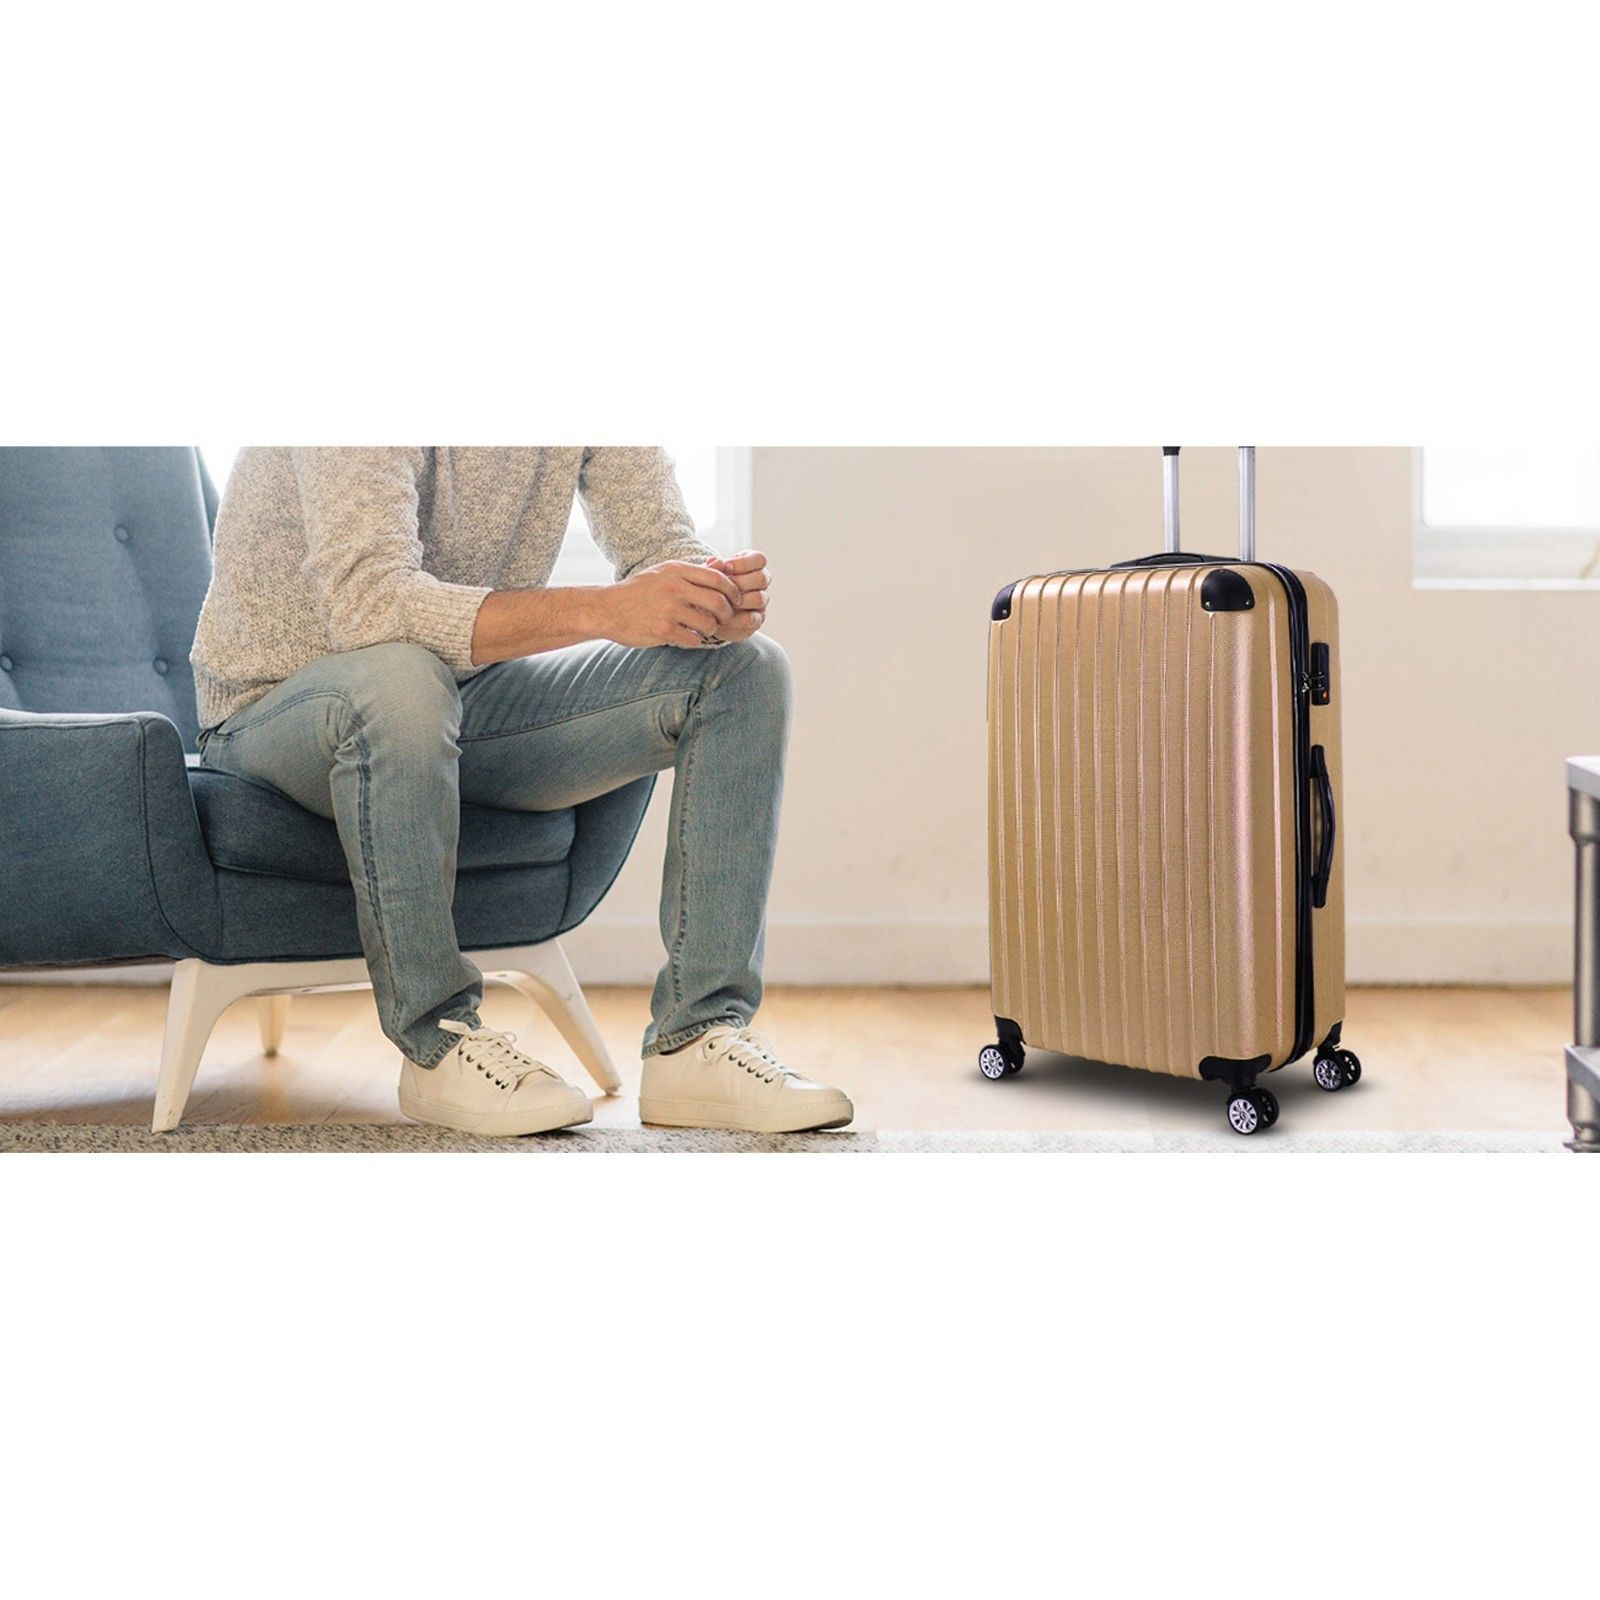 Milano-Premium-3pc-ABS-Luggage-Suitcase-Luxury-Hard-Case-Shockproof-Travel-Set thumbnail 18